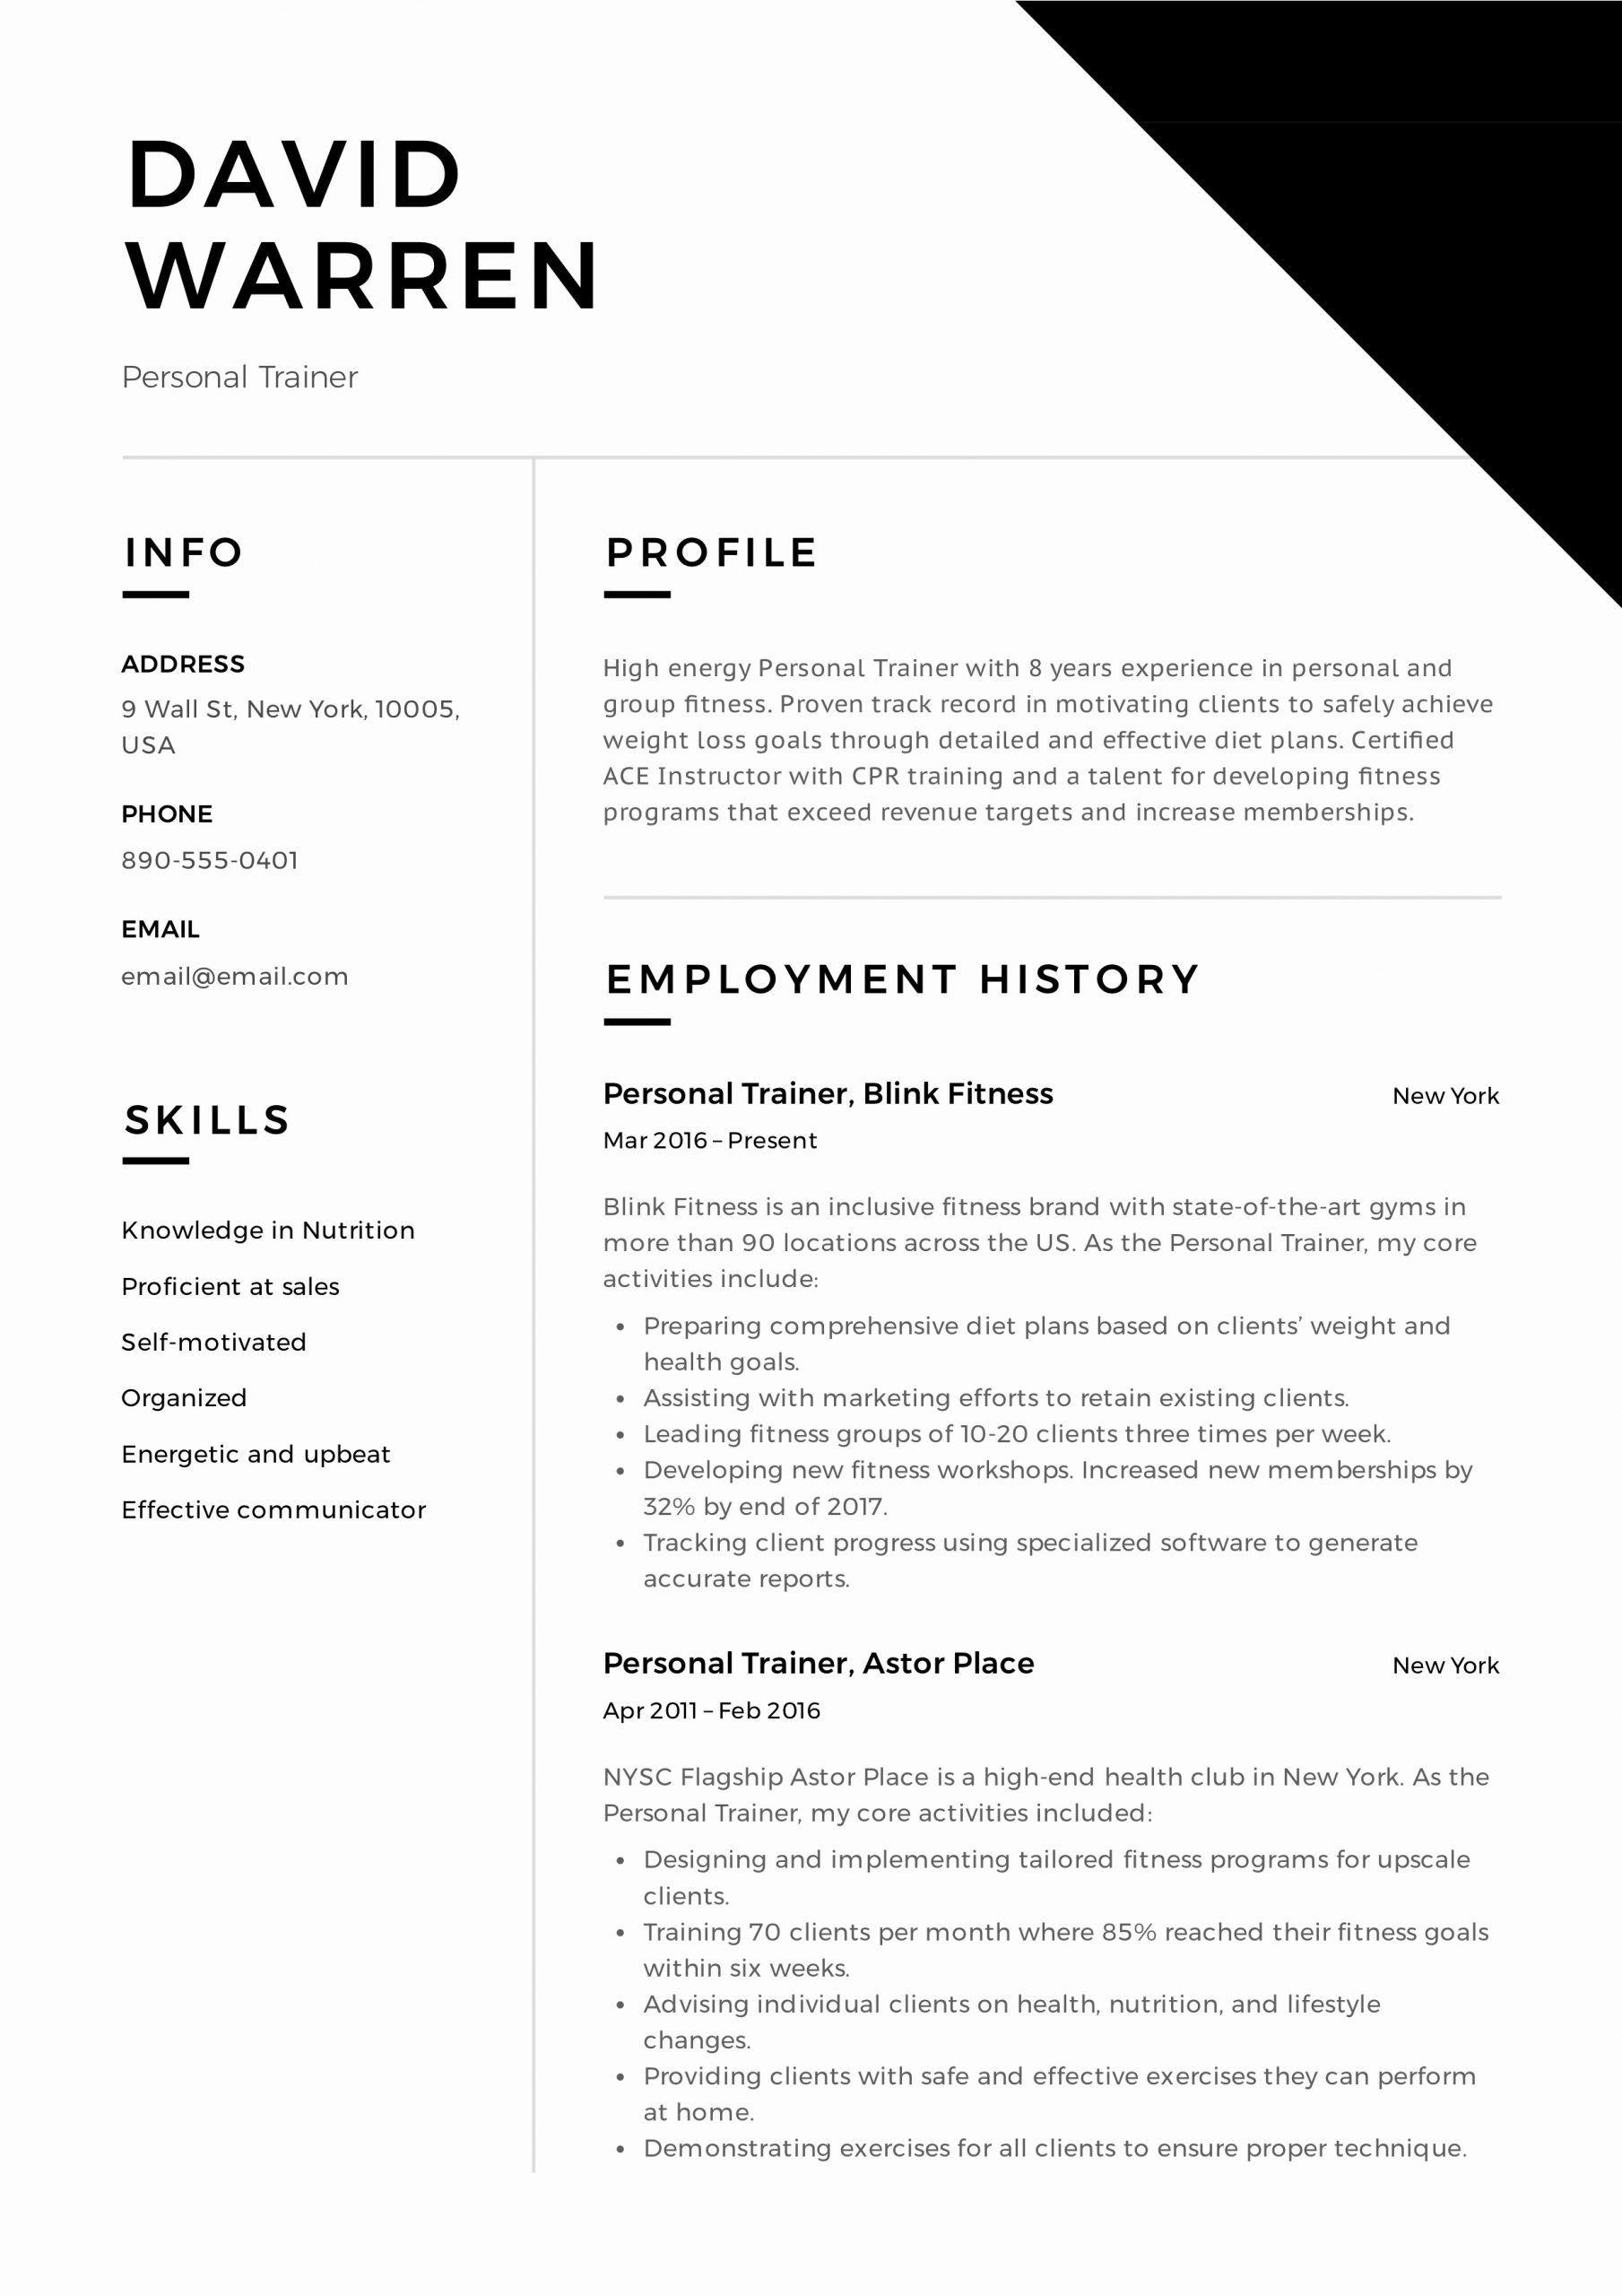 Personal Trainer Resume Examples Unique Personal Trainer Resume Example Template Sample Cv Event Planner Resume Professional Resume Examples Resume Examples